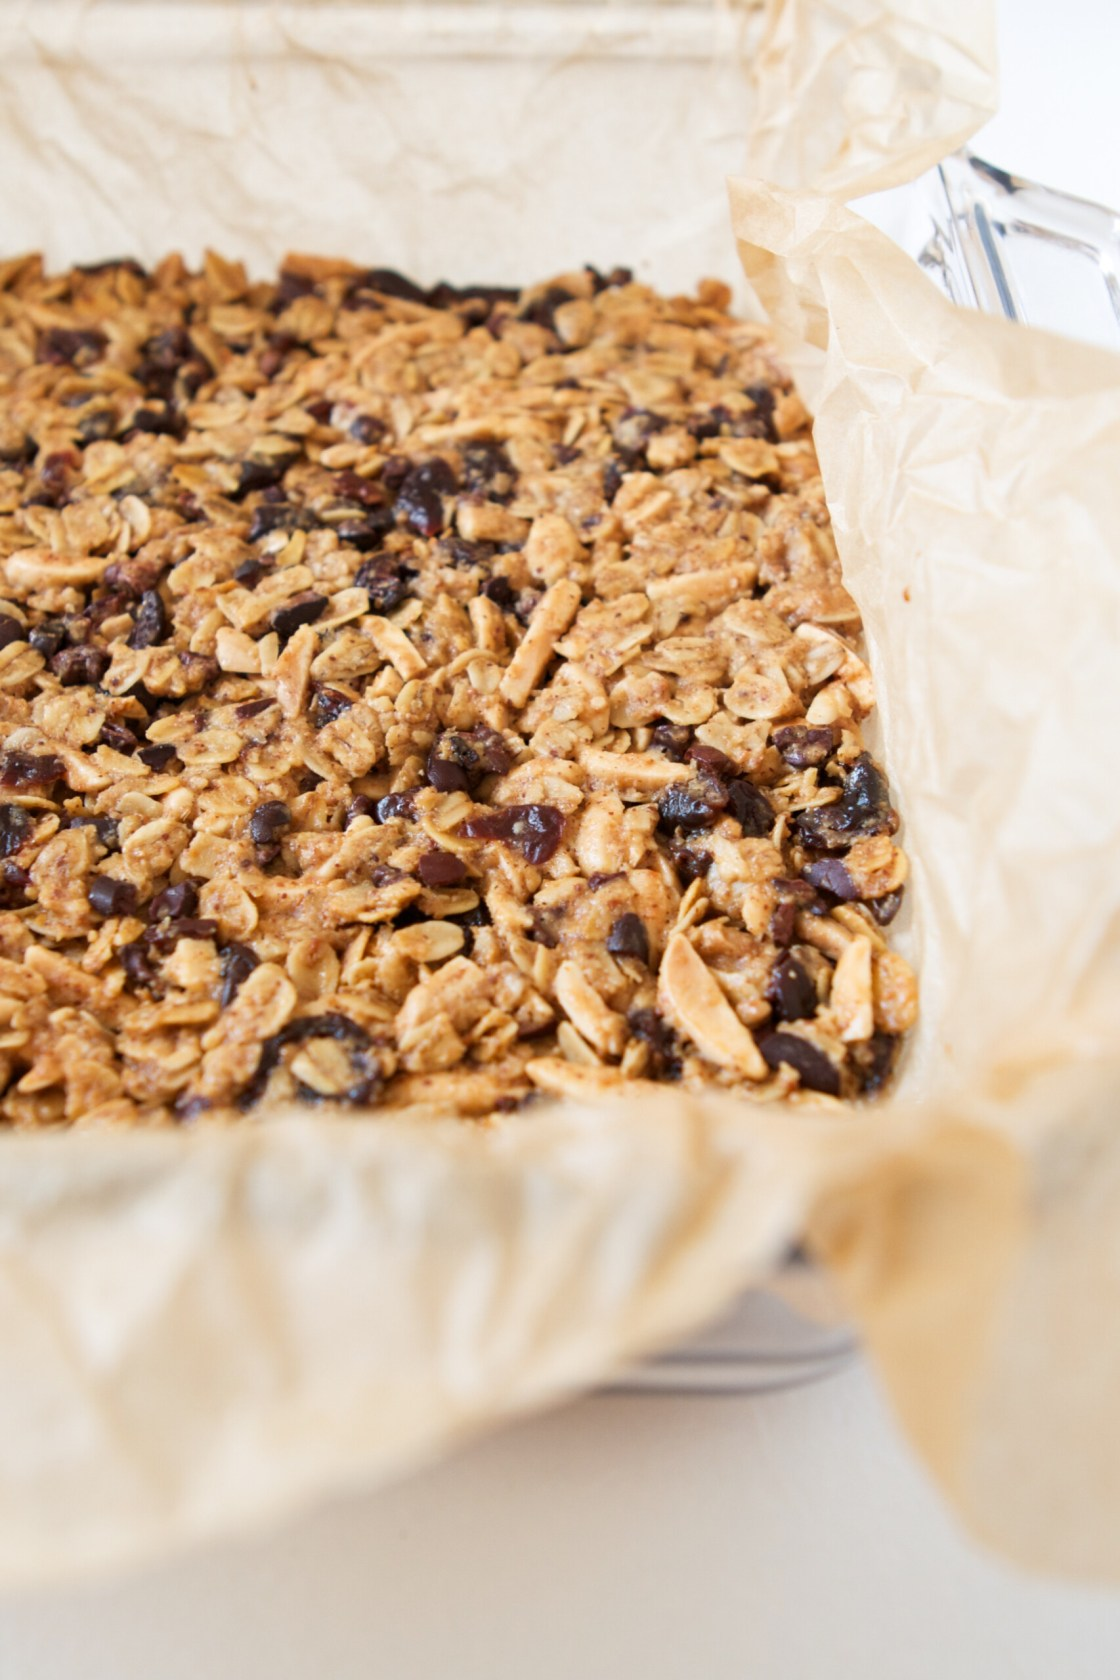 Cherry & Almond Granola Bites with Cocoa Nibs | Zestful Kitchen